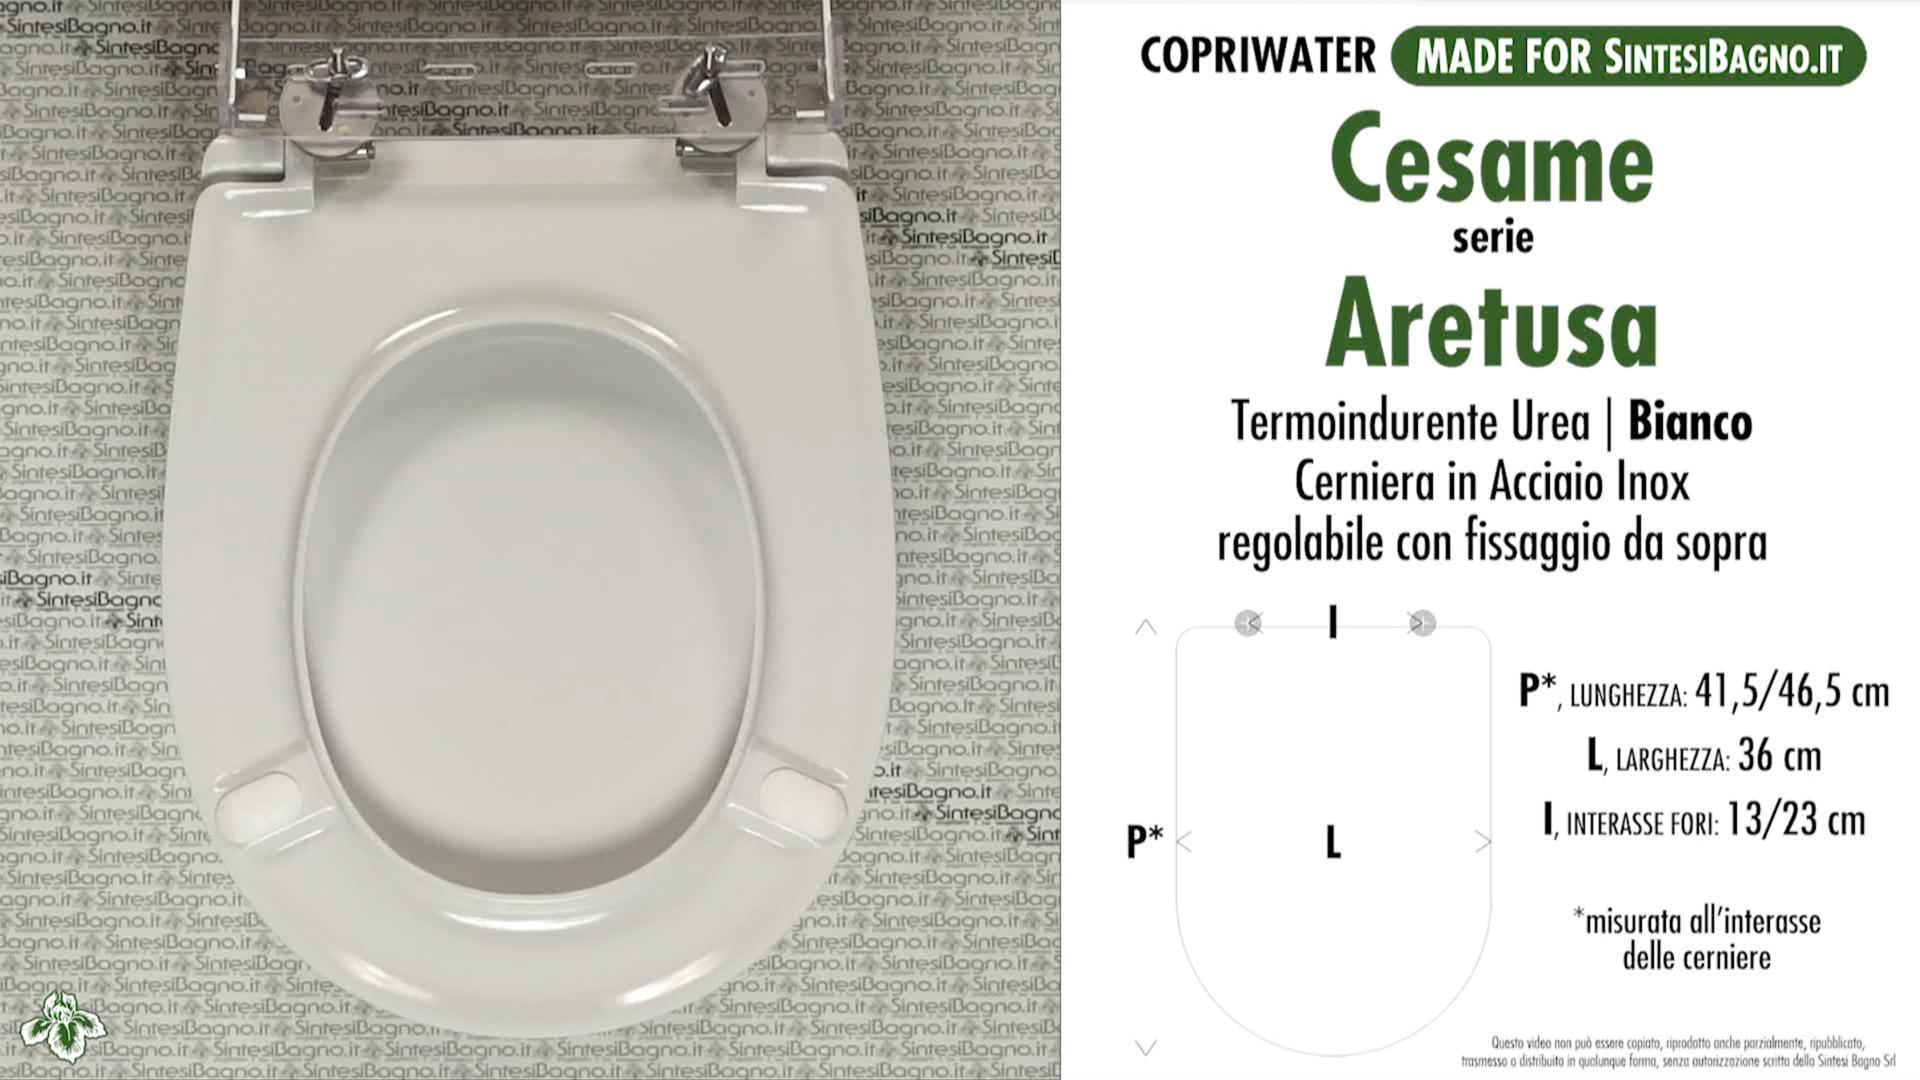 Sedile Wc Cesame Aretusa.Copriwater Per Wc Aretusa Cesame Ricambio Dedicato Duroplast Sintesibagno Shop Online